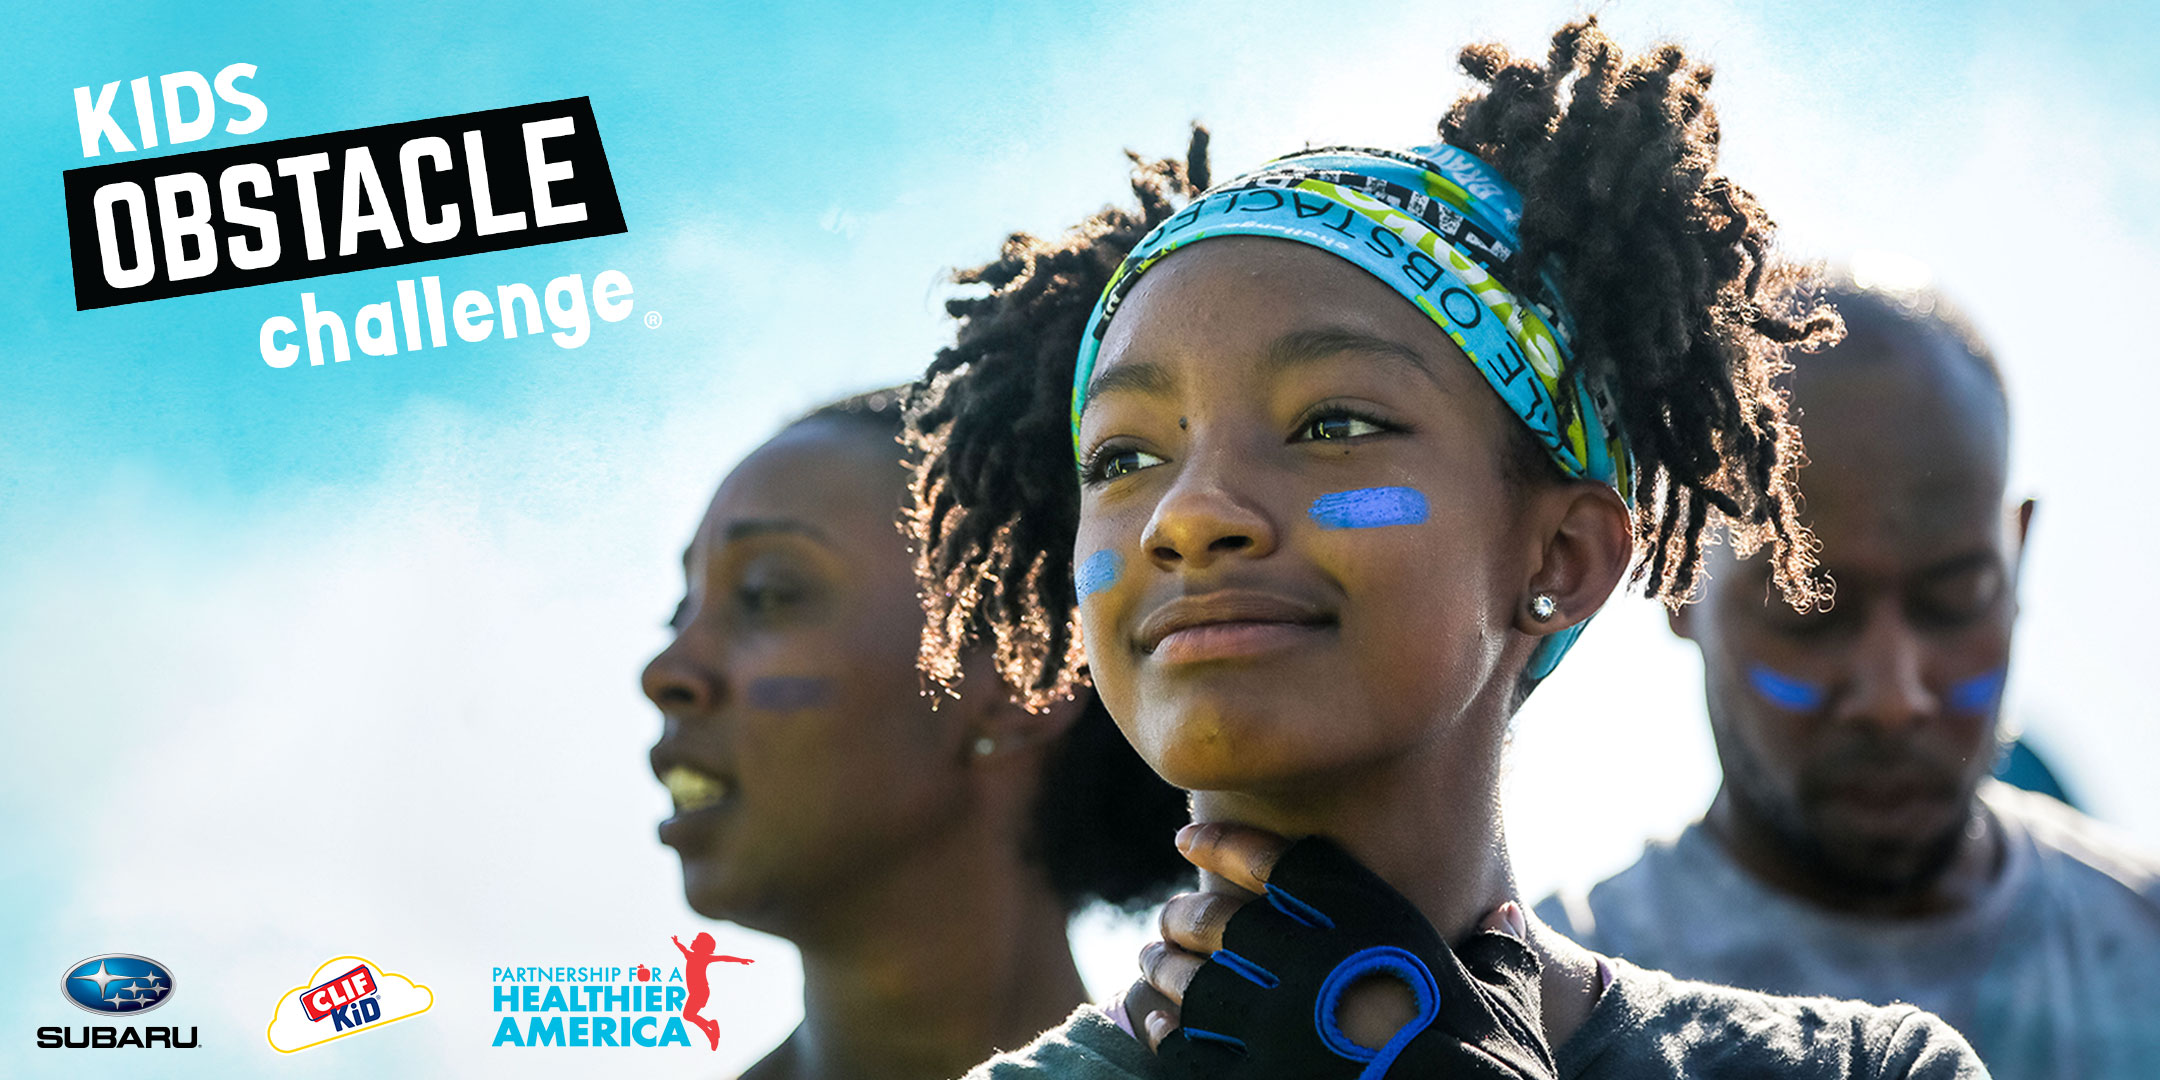 Subaru Kids Obstacle Challenge - San Diego - Sunday